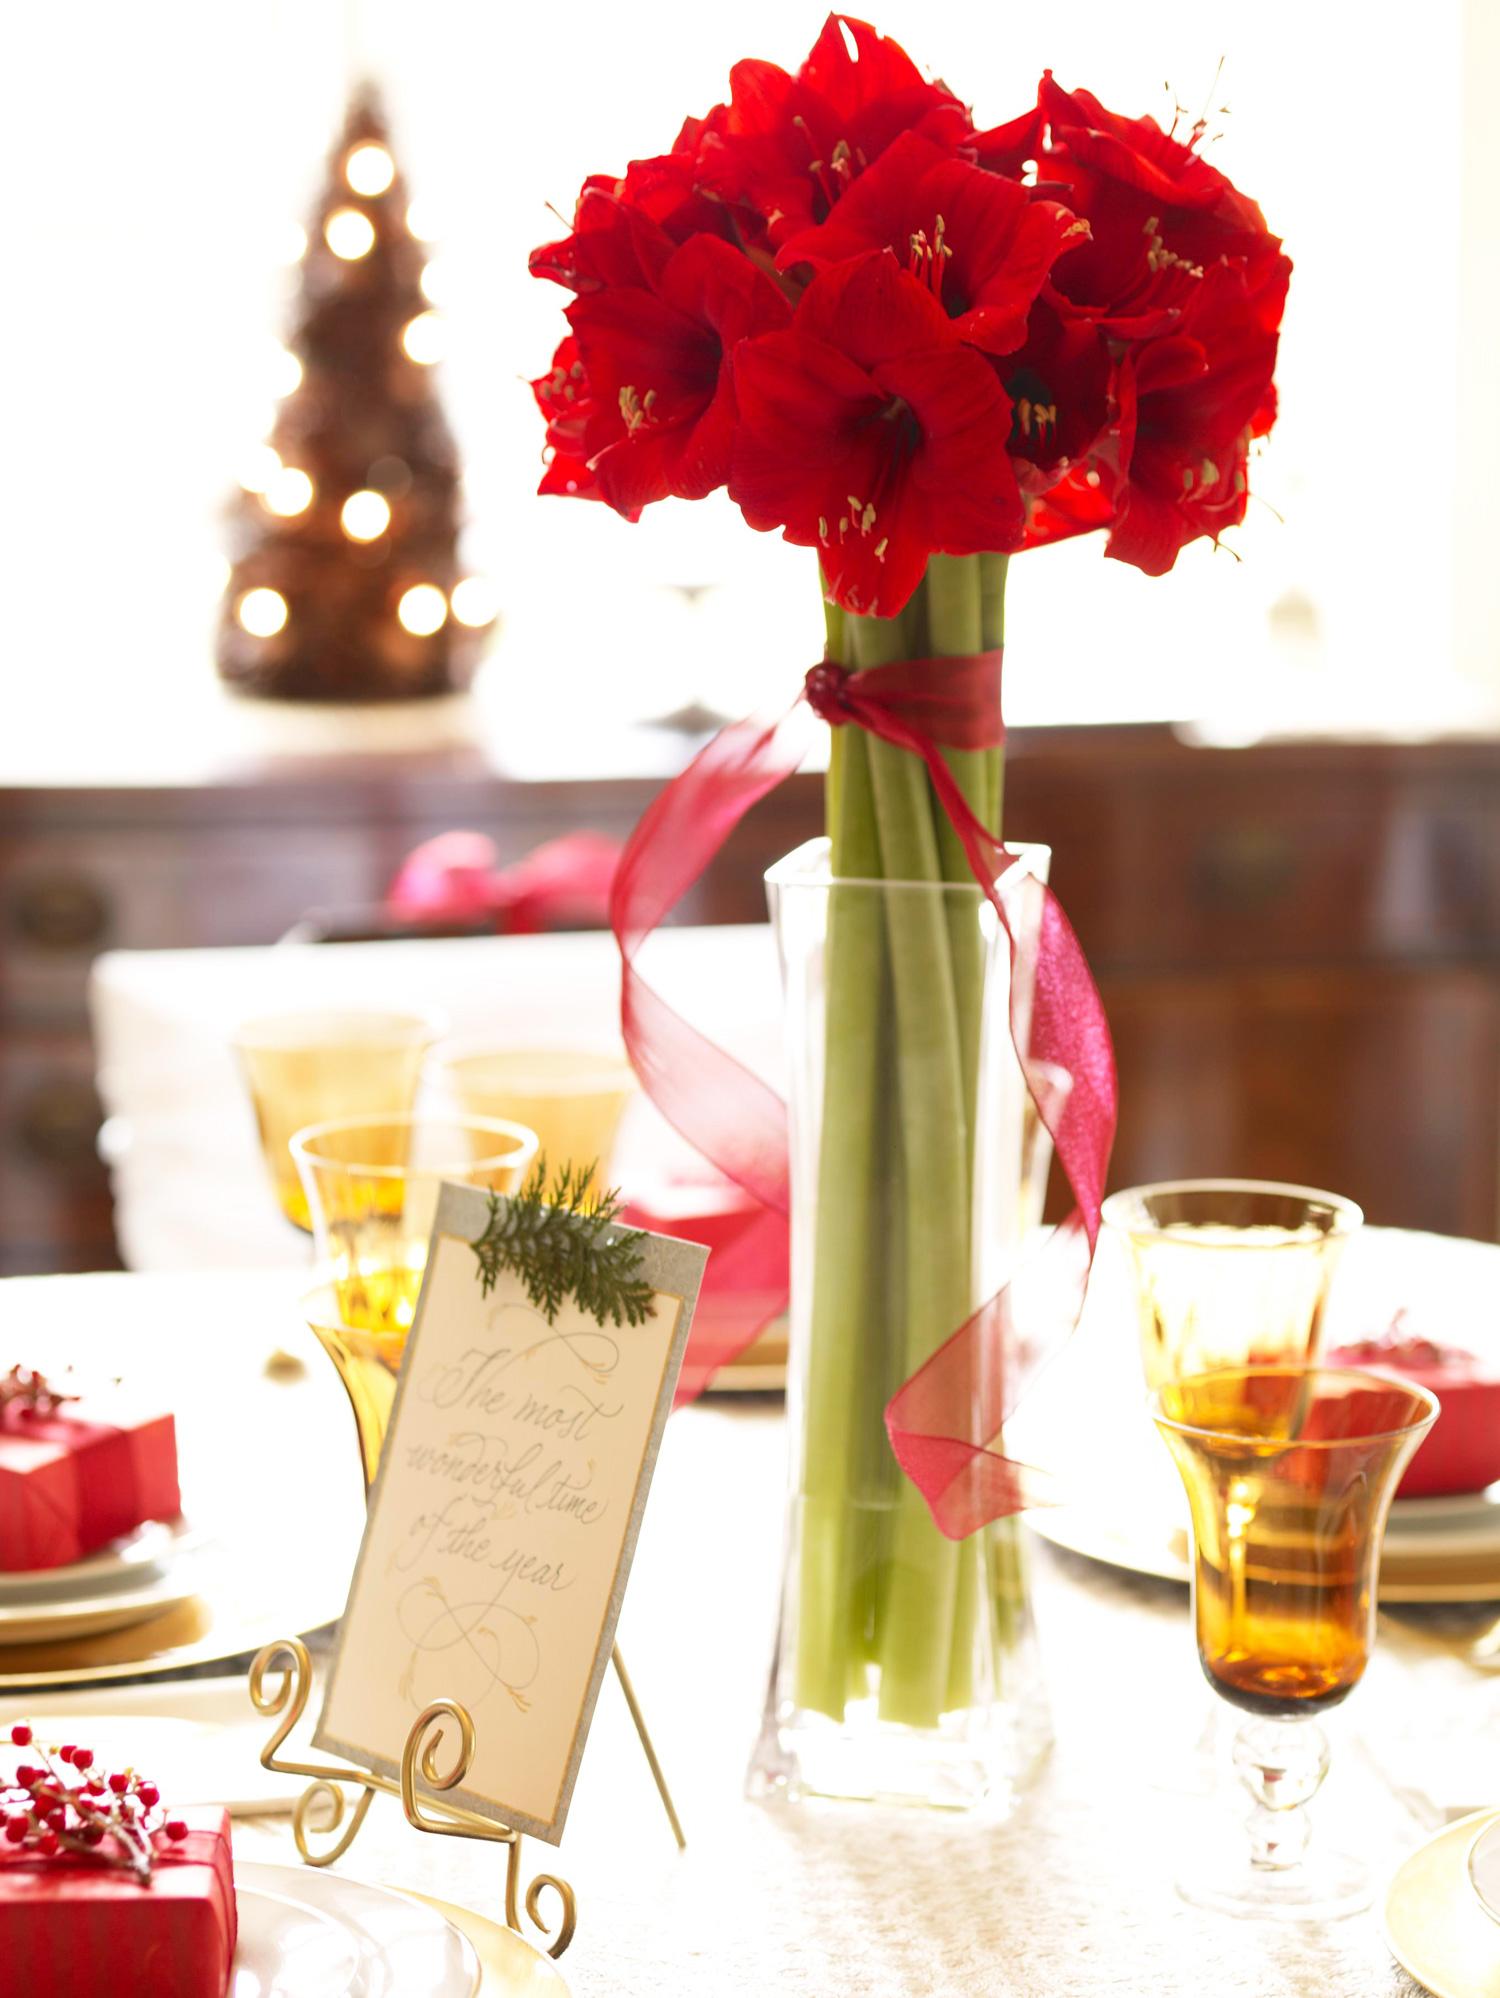 Christmas centerpiece ideas: amaryllis